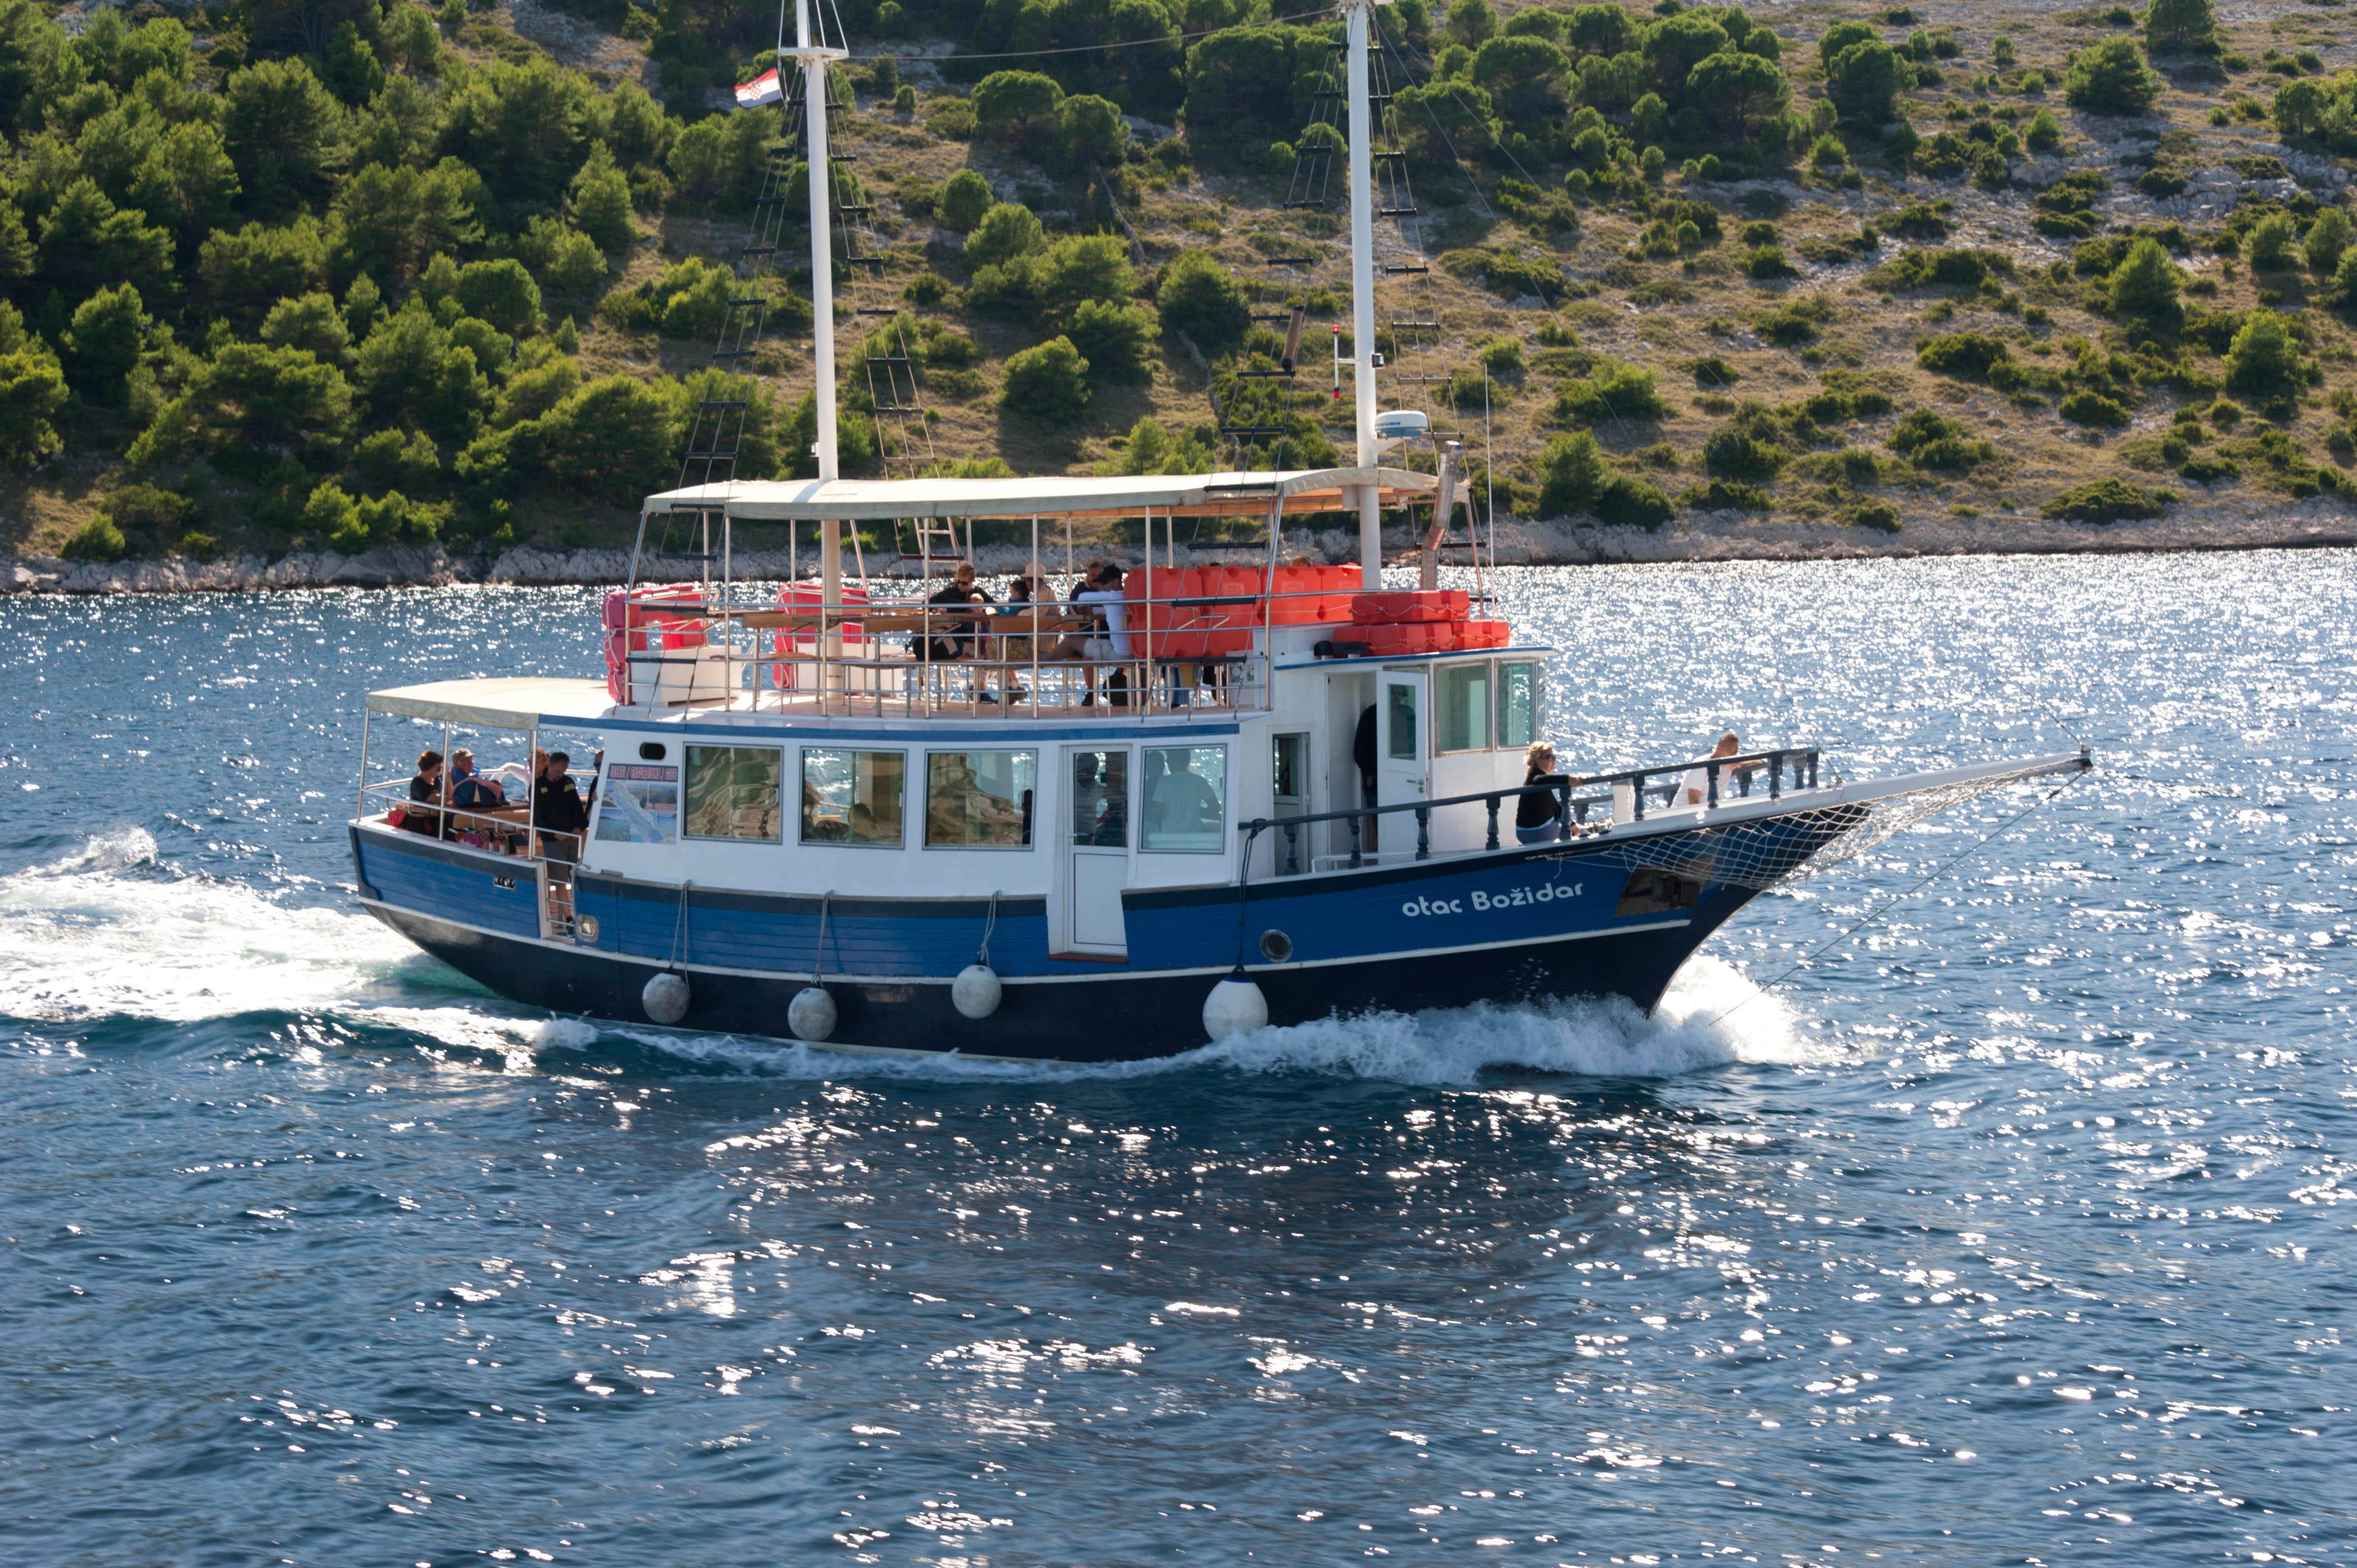 9720-Parc national iles Kornati (Dalmatie du Nord)